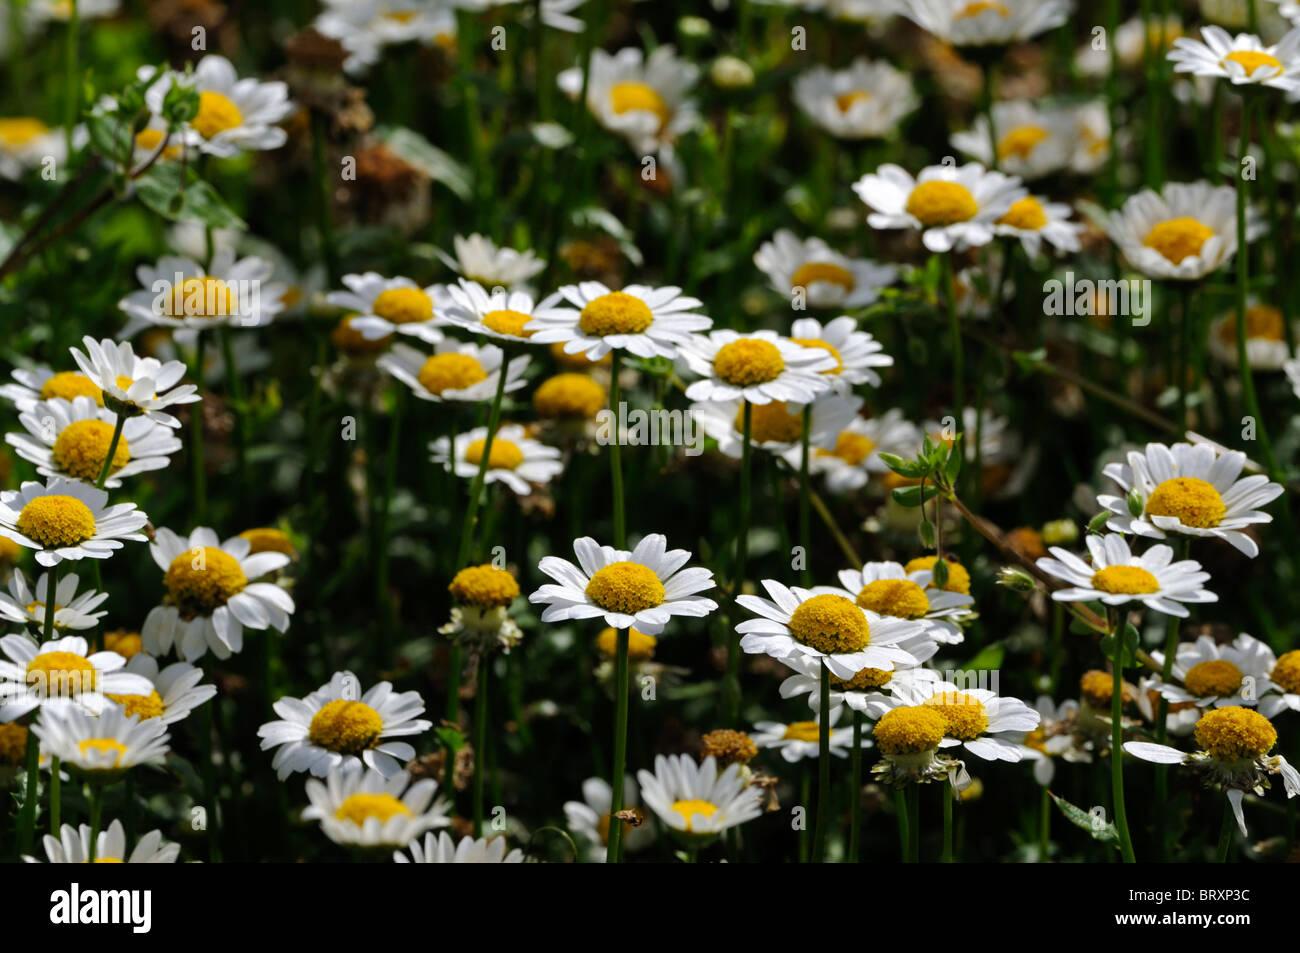 Flower Mum Chrysanth Chrysanthemum Stock Photos Flower Mum